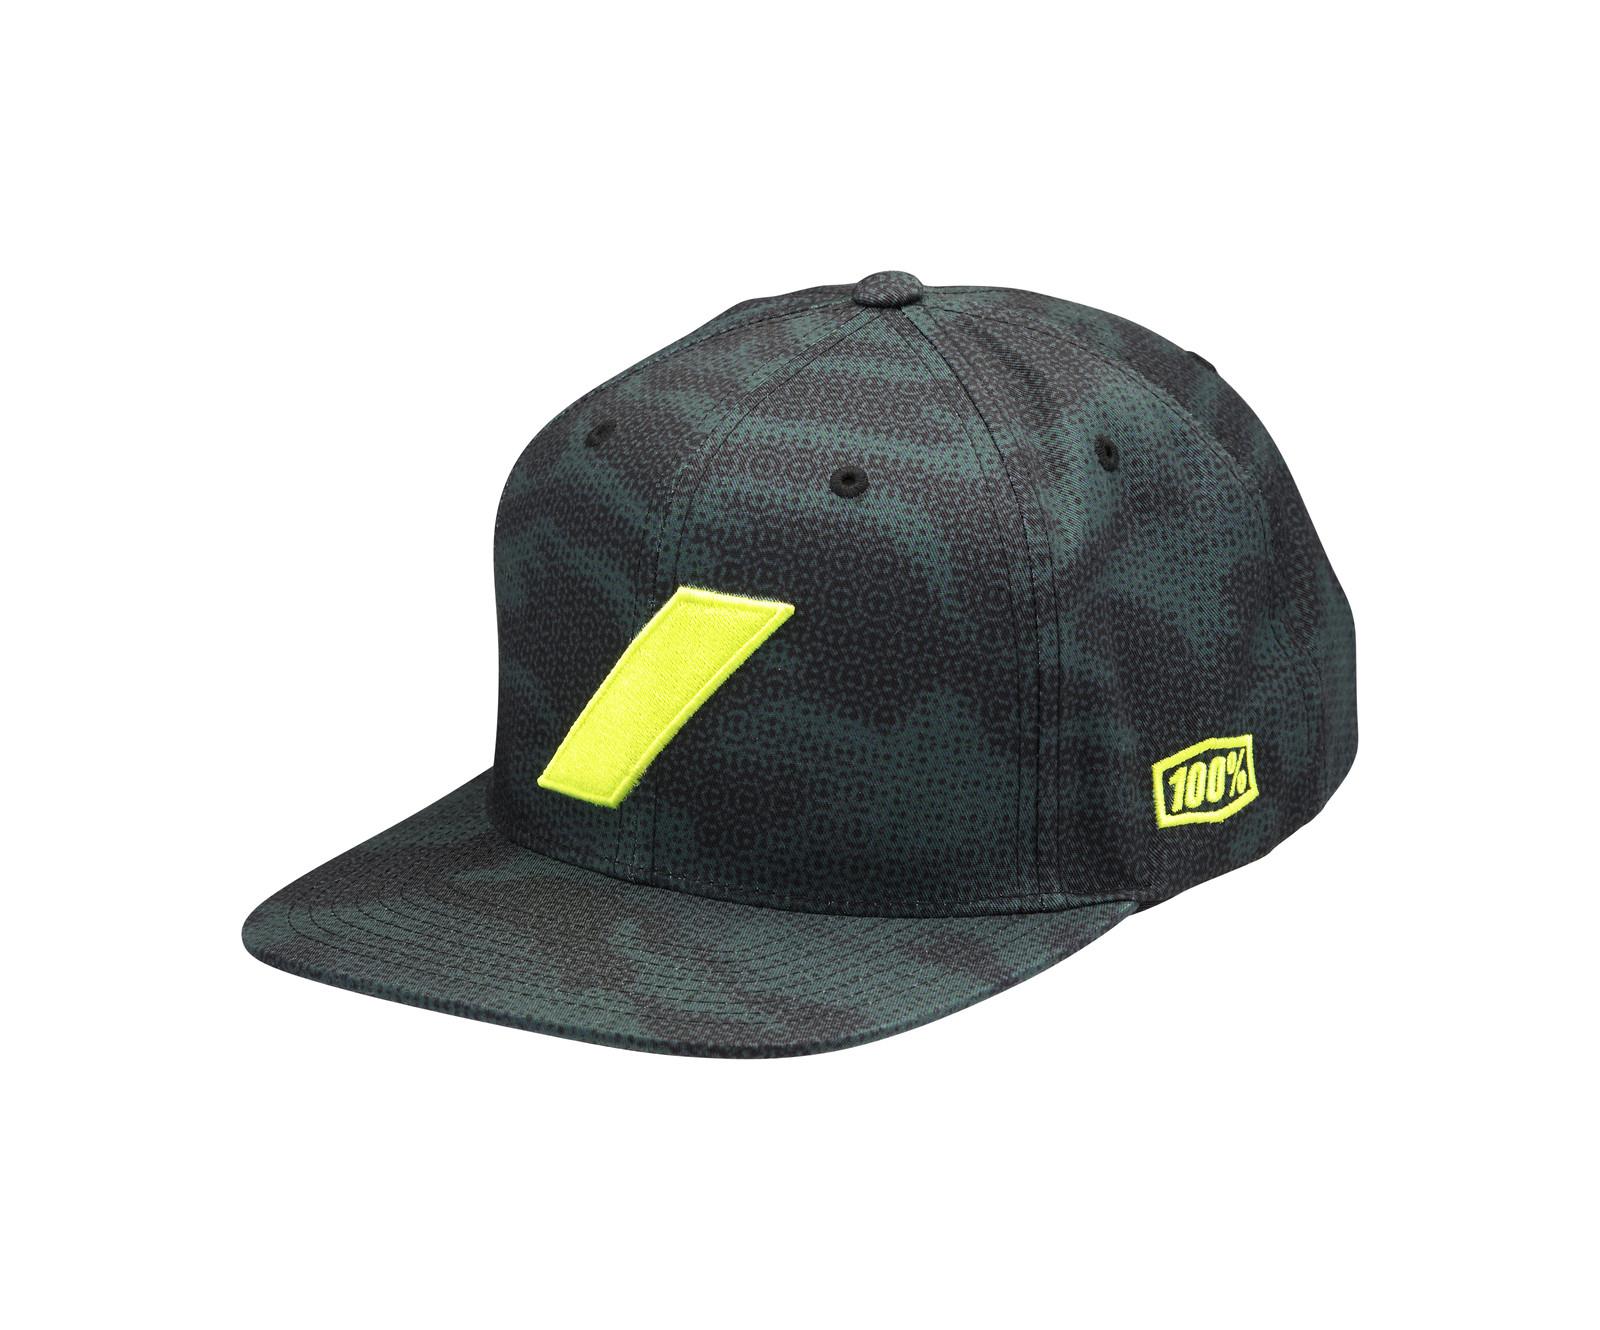 100% Slash Green Hat - 100percent - Motocross Pictures - Vital MX